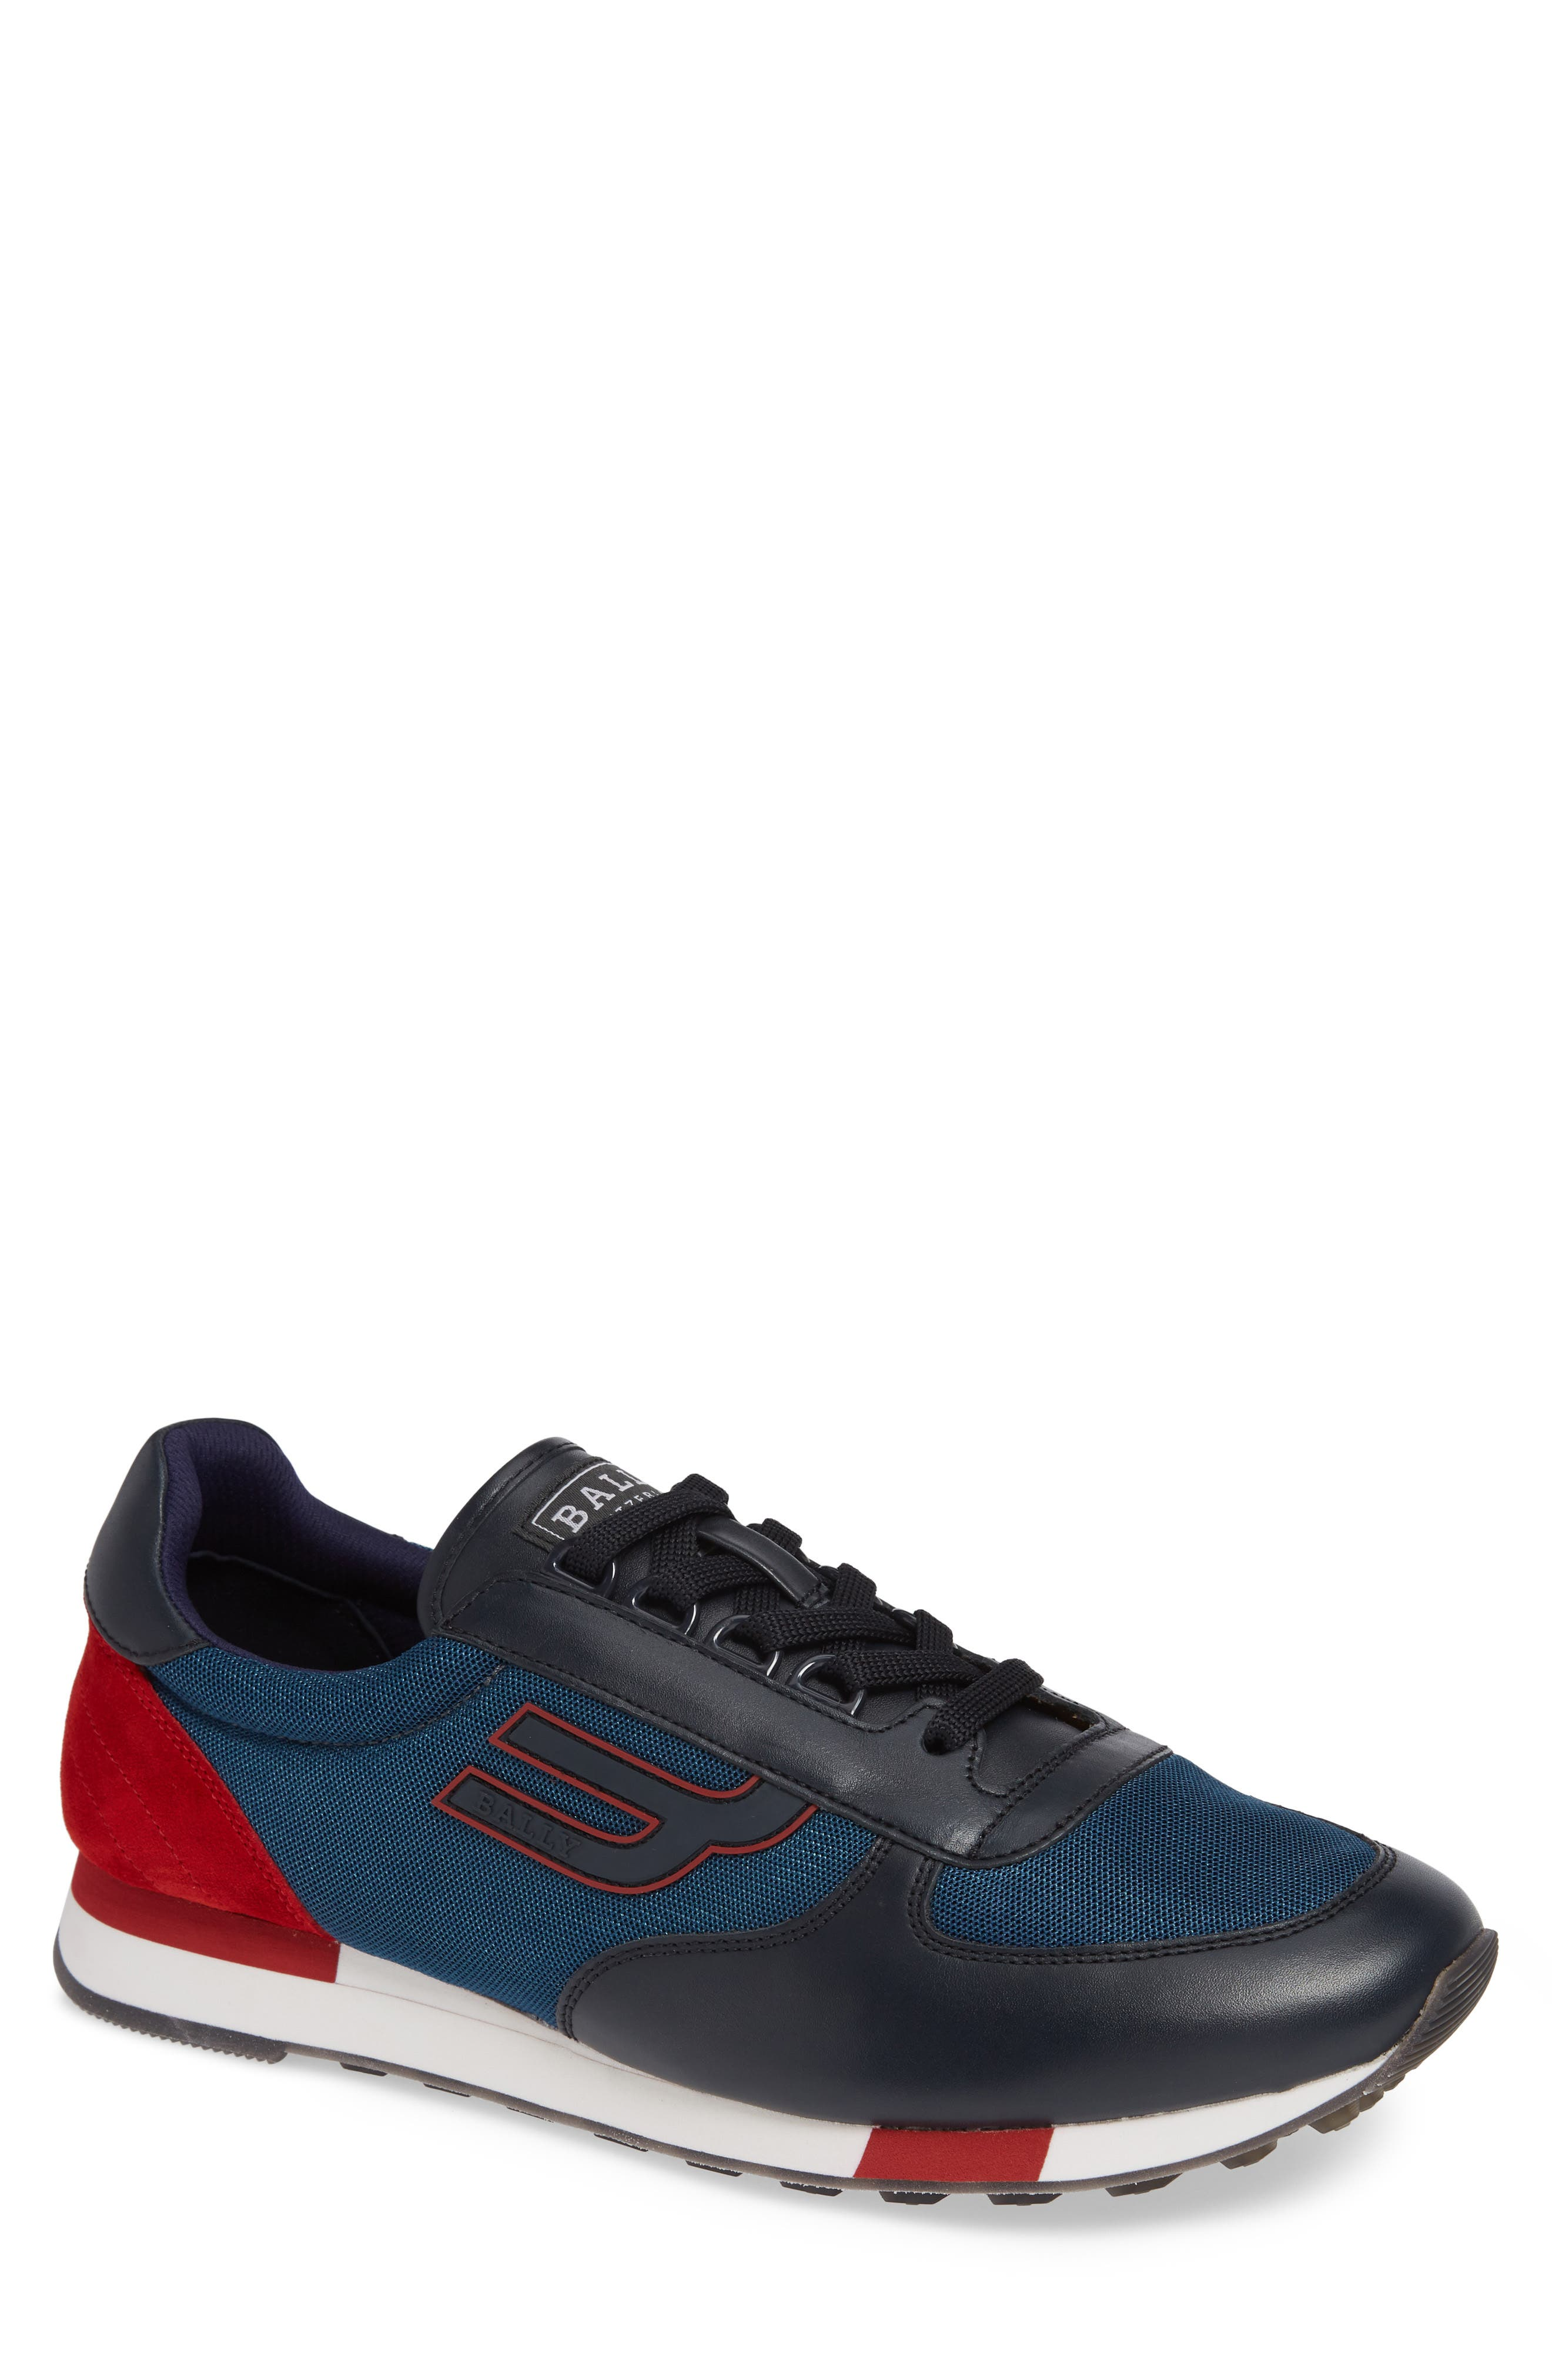 Gavino Low Top Sneaker,                             Main thumbnail 1, color,                             Blue